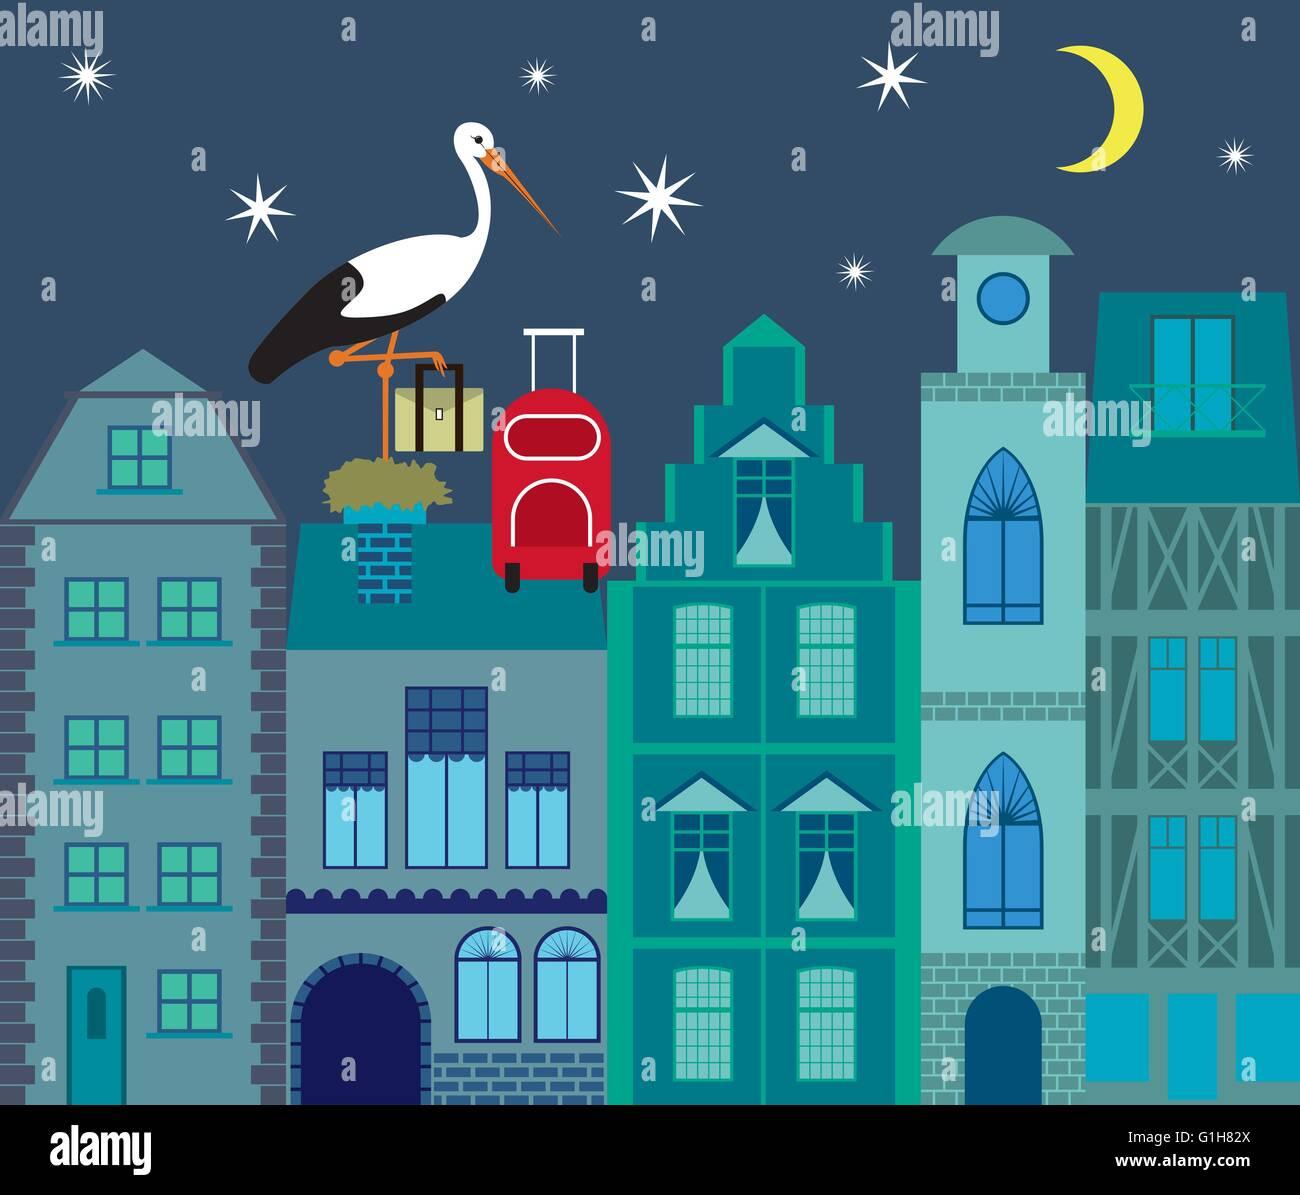 Stork migration flat design vector illustration - Stock Vector